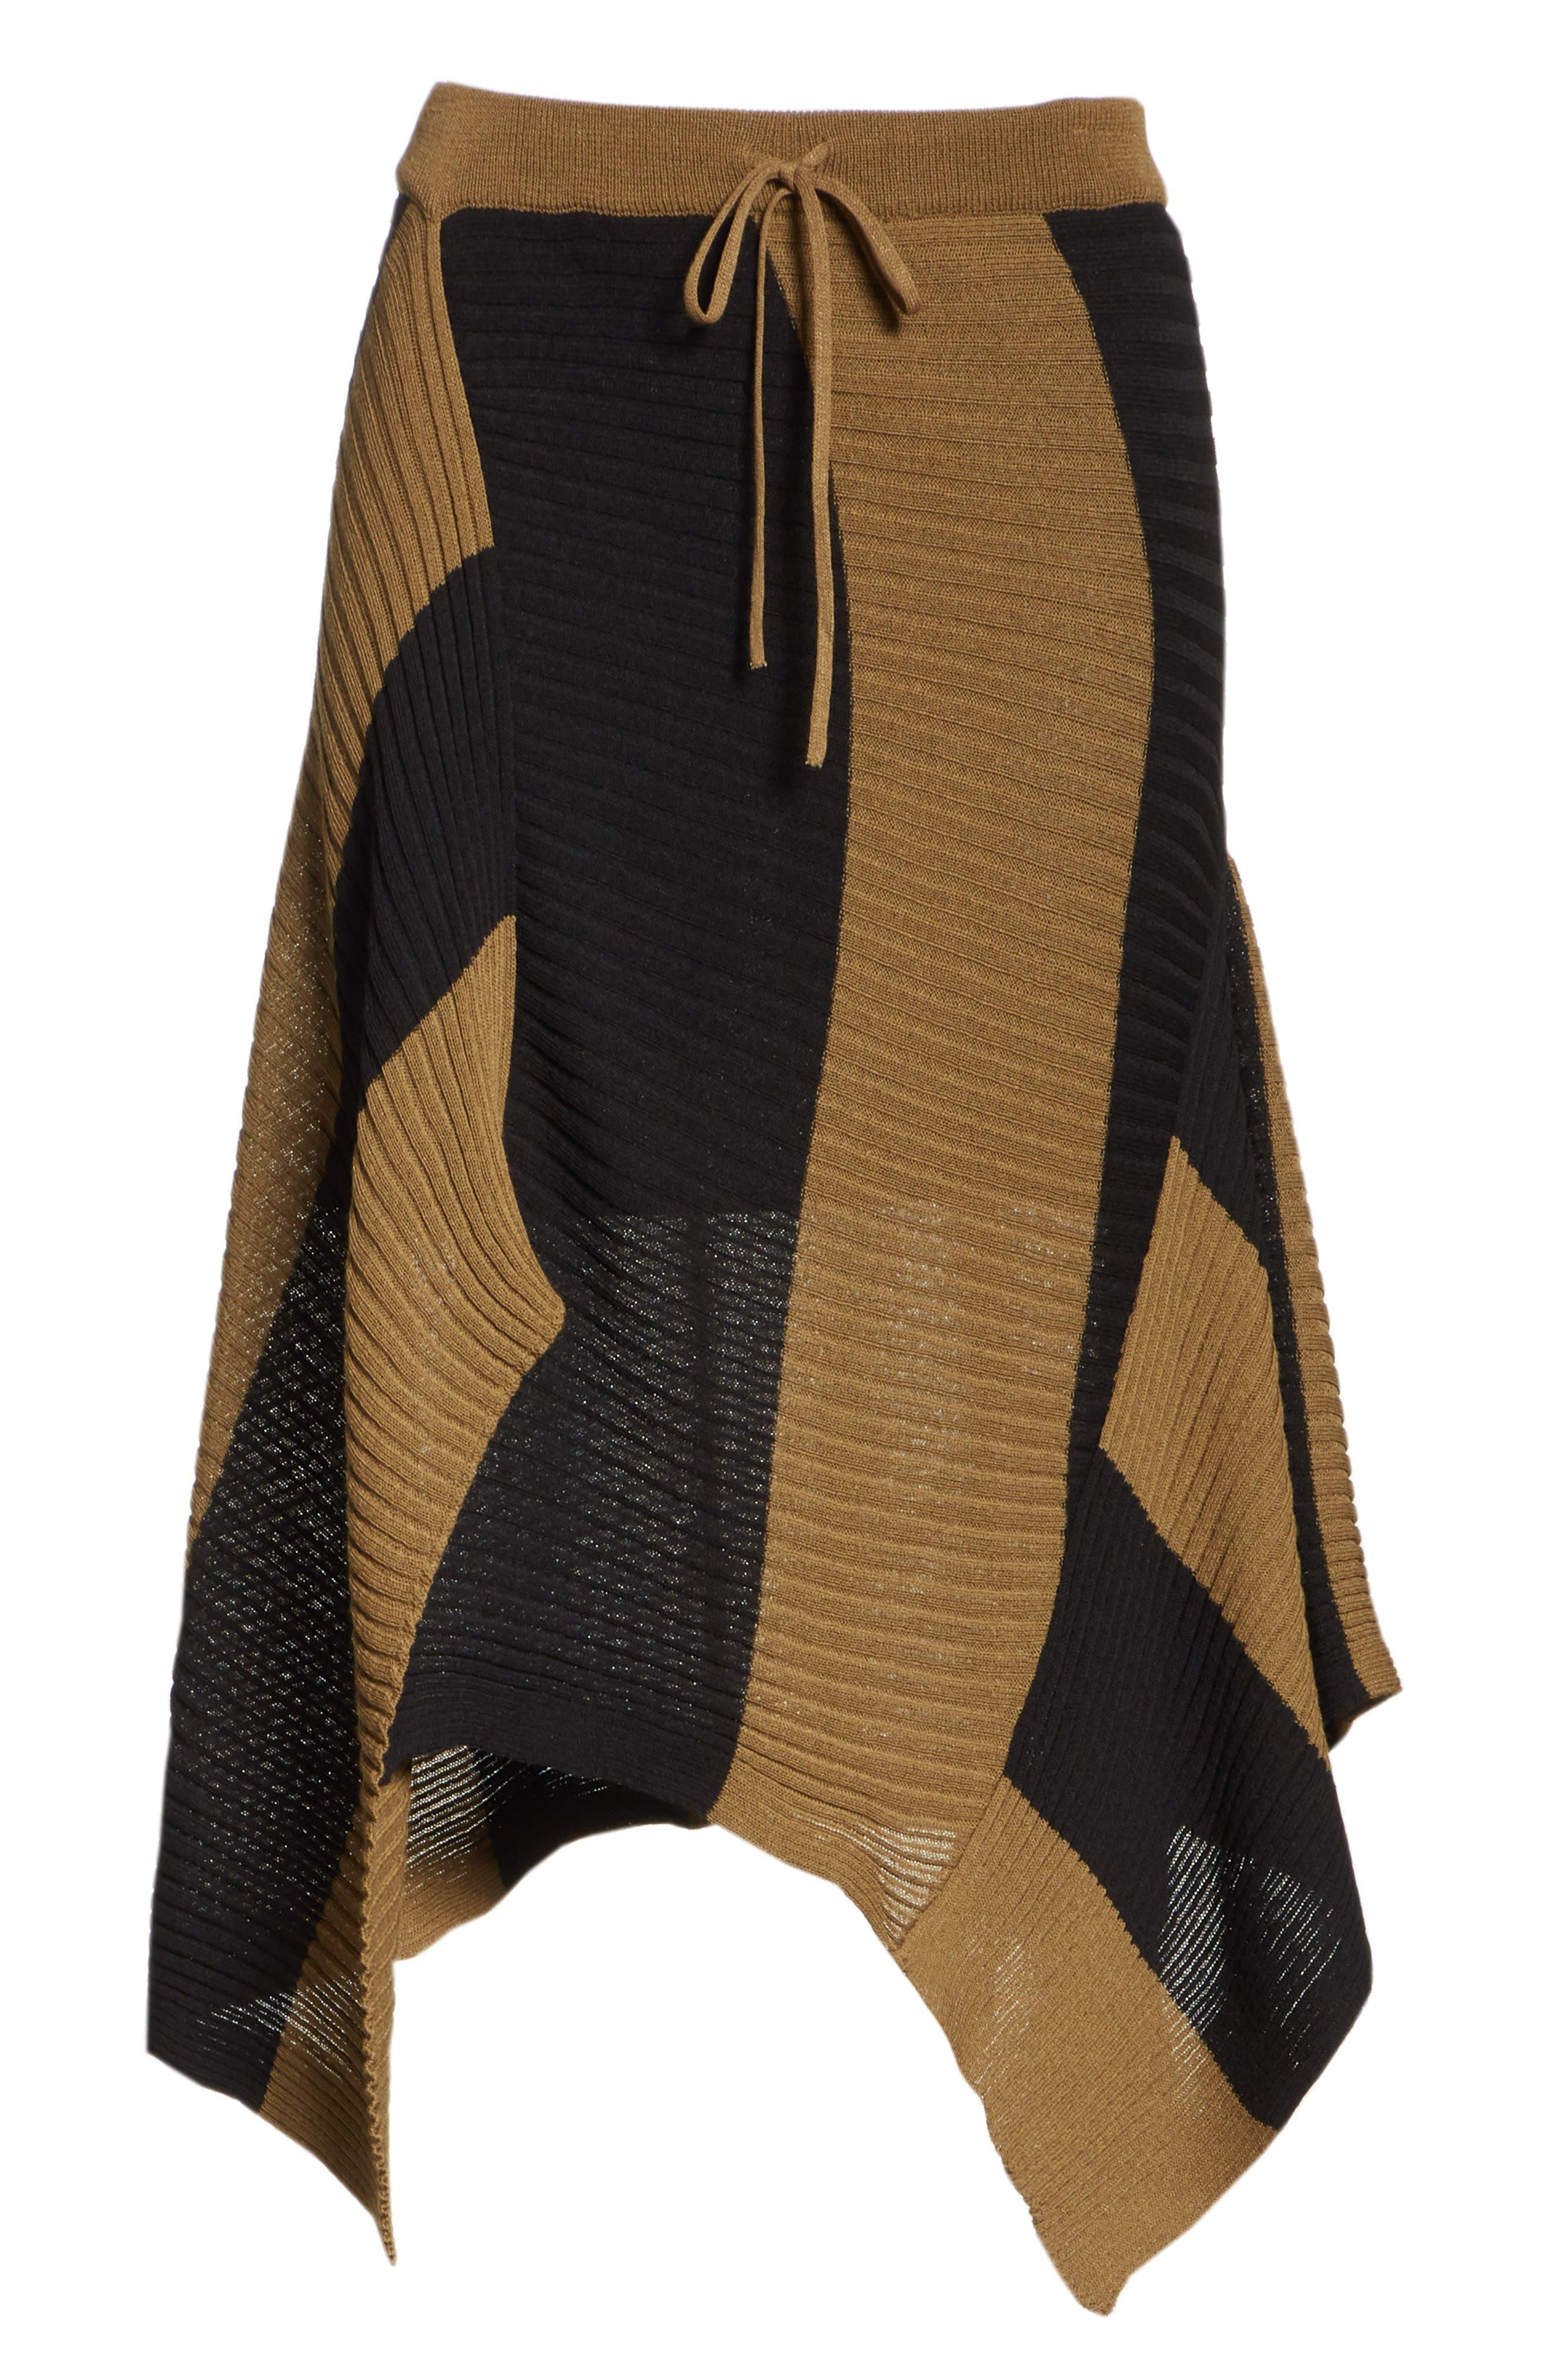 Marques'Almeida Draped Skirt,                             Alternate thumbnail 7, color,                             Khaki/ Black